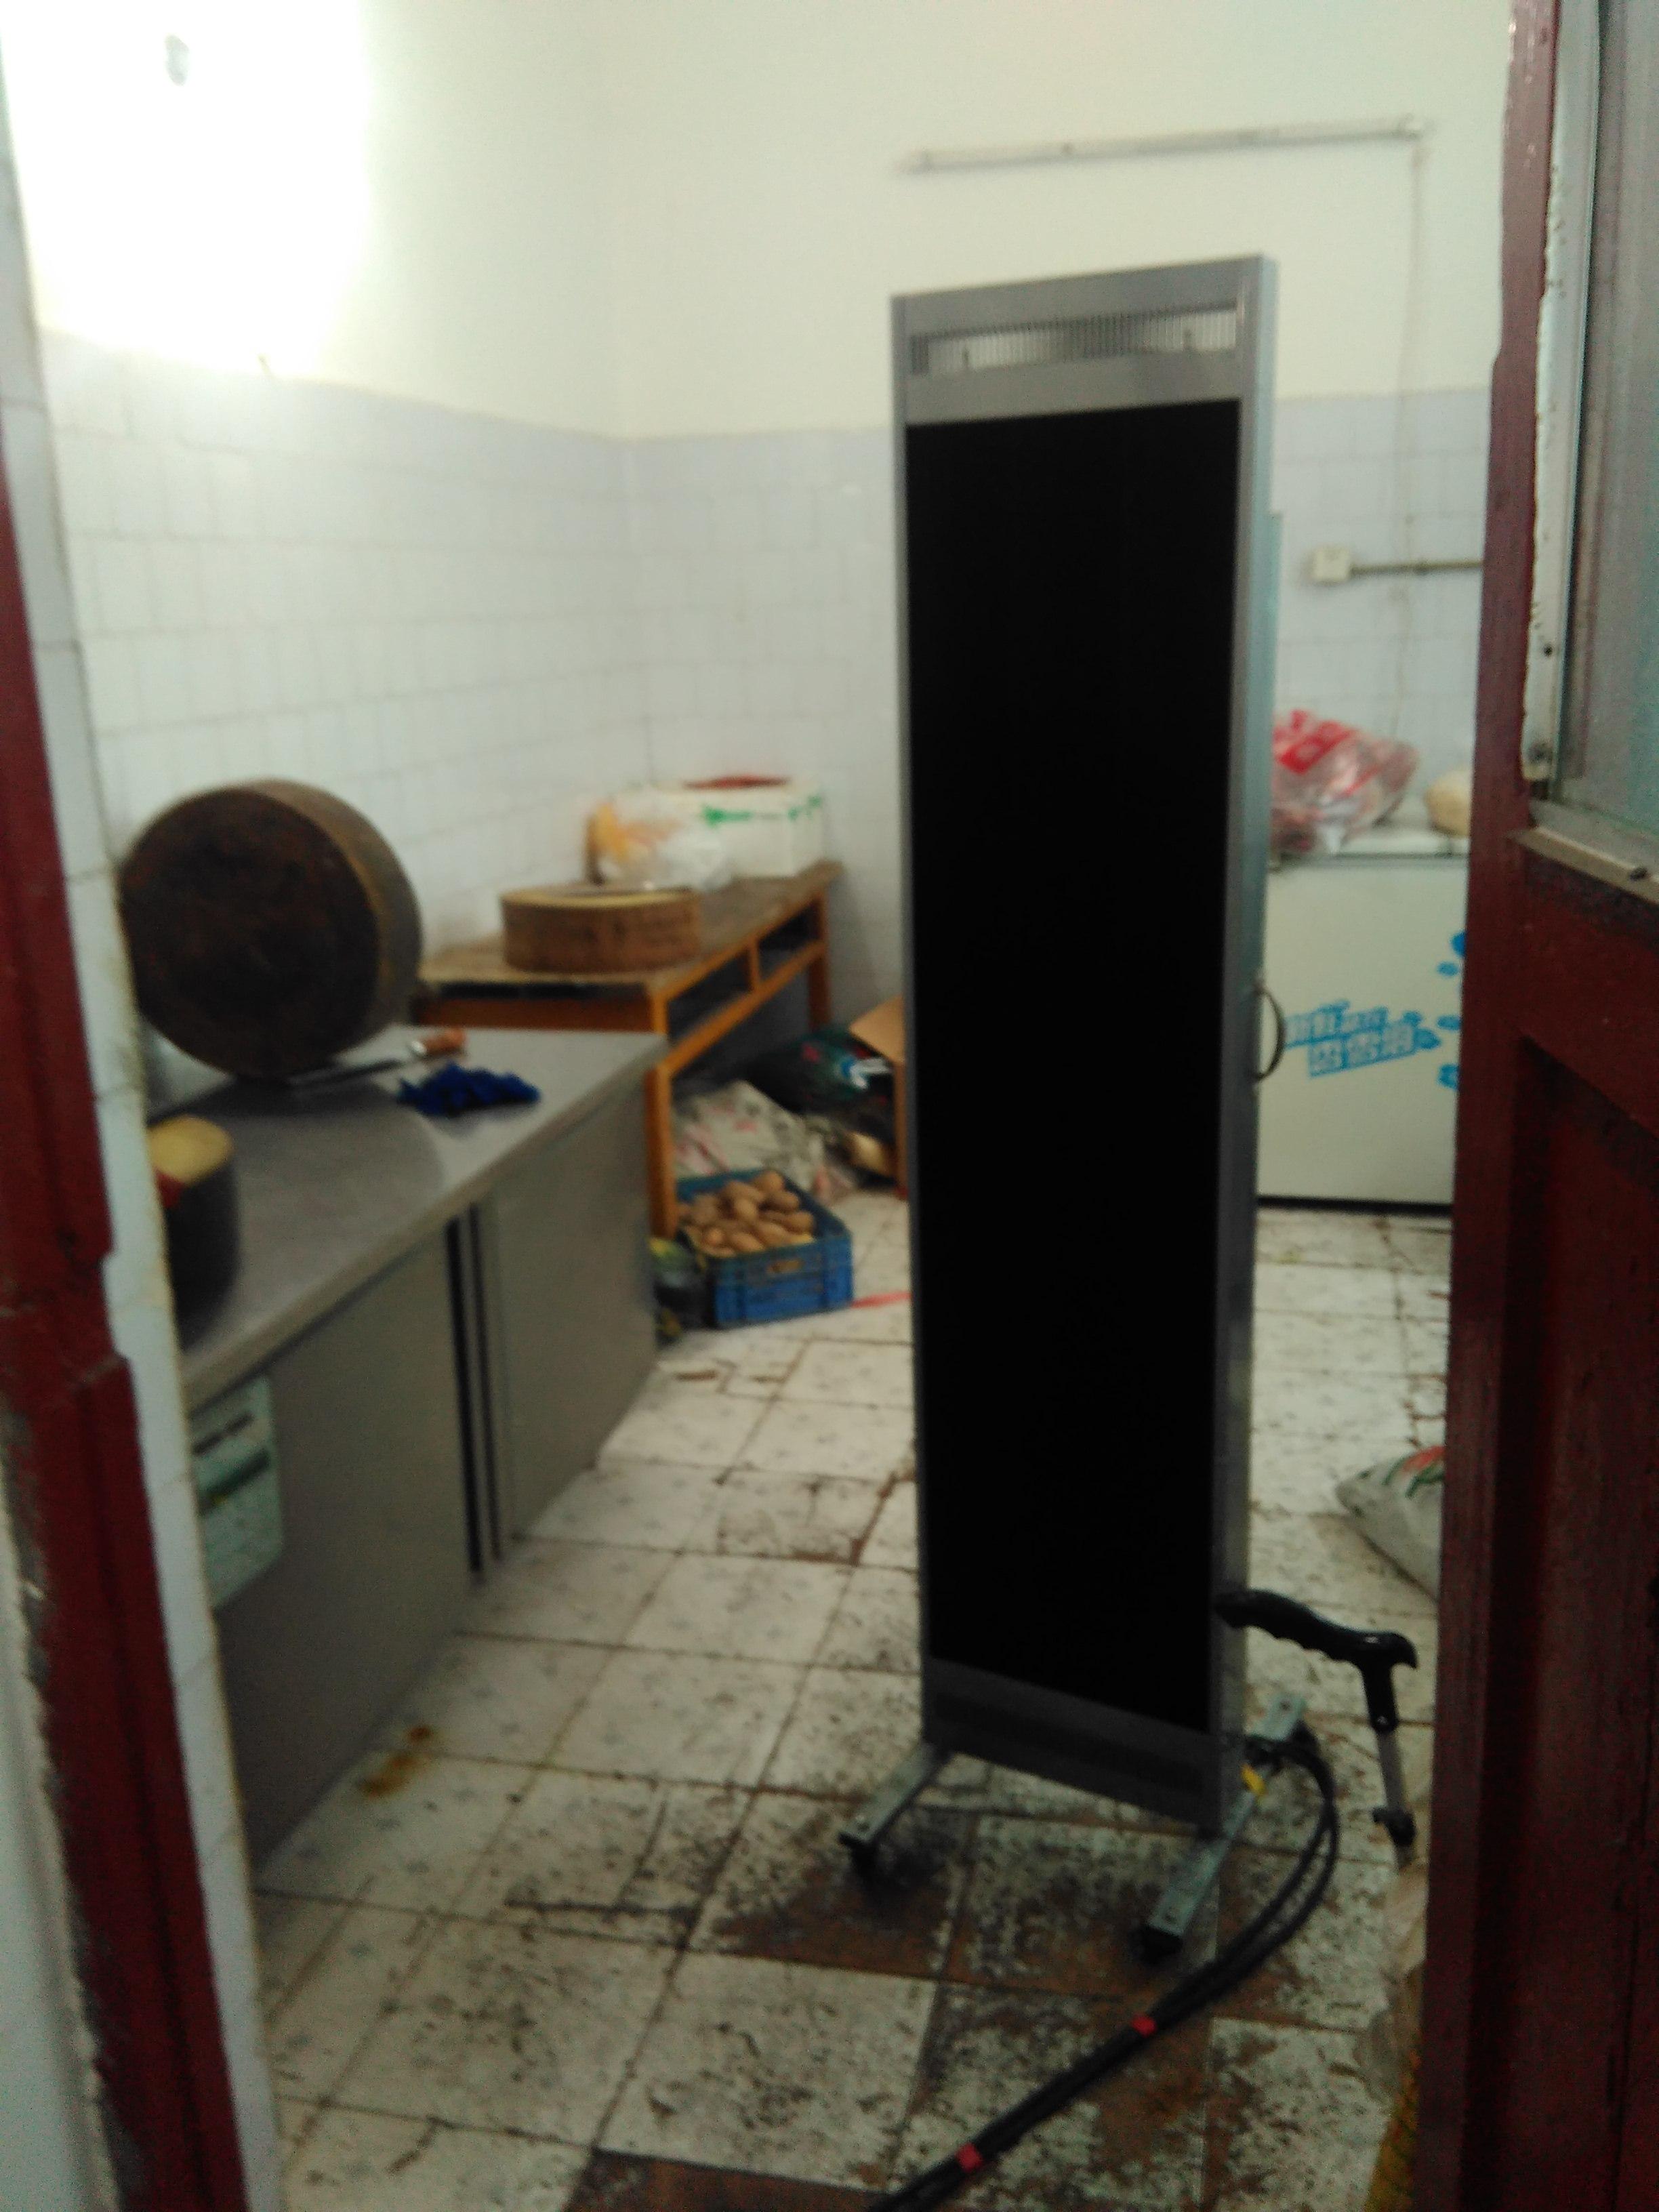 vwin德赢备用网址酒店采暖工程